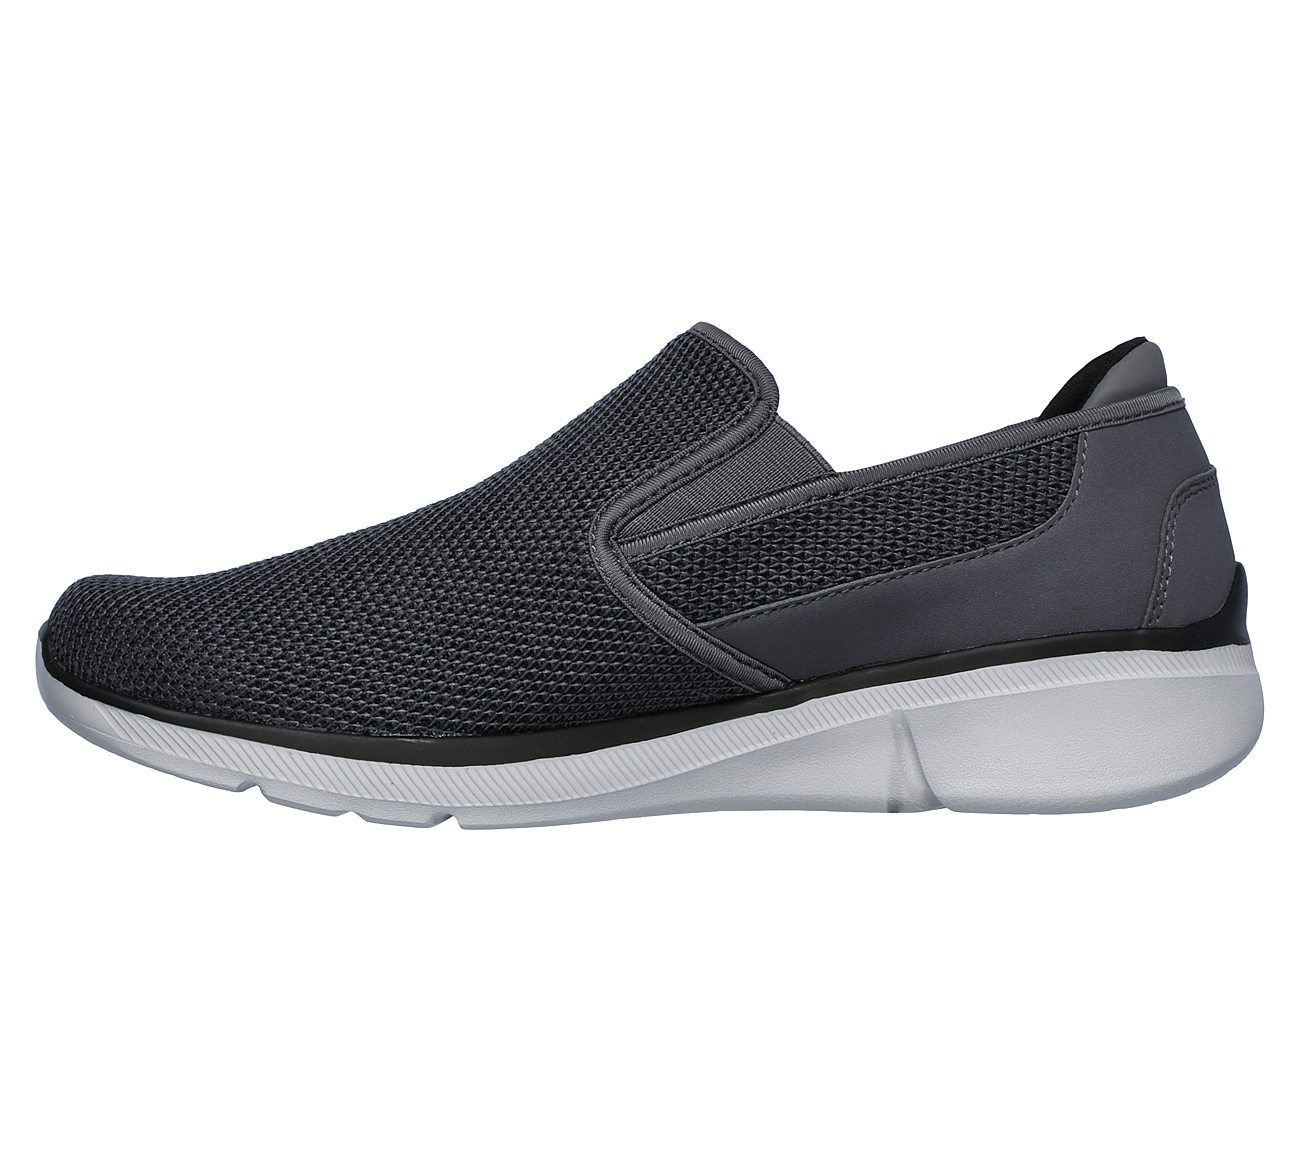 SKECHERS Men's Extra Wide Fit Equalizer 3.0 Sumnin Walking shoe in Navy